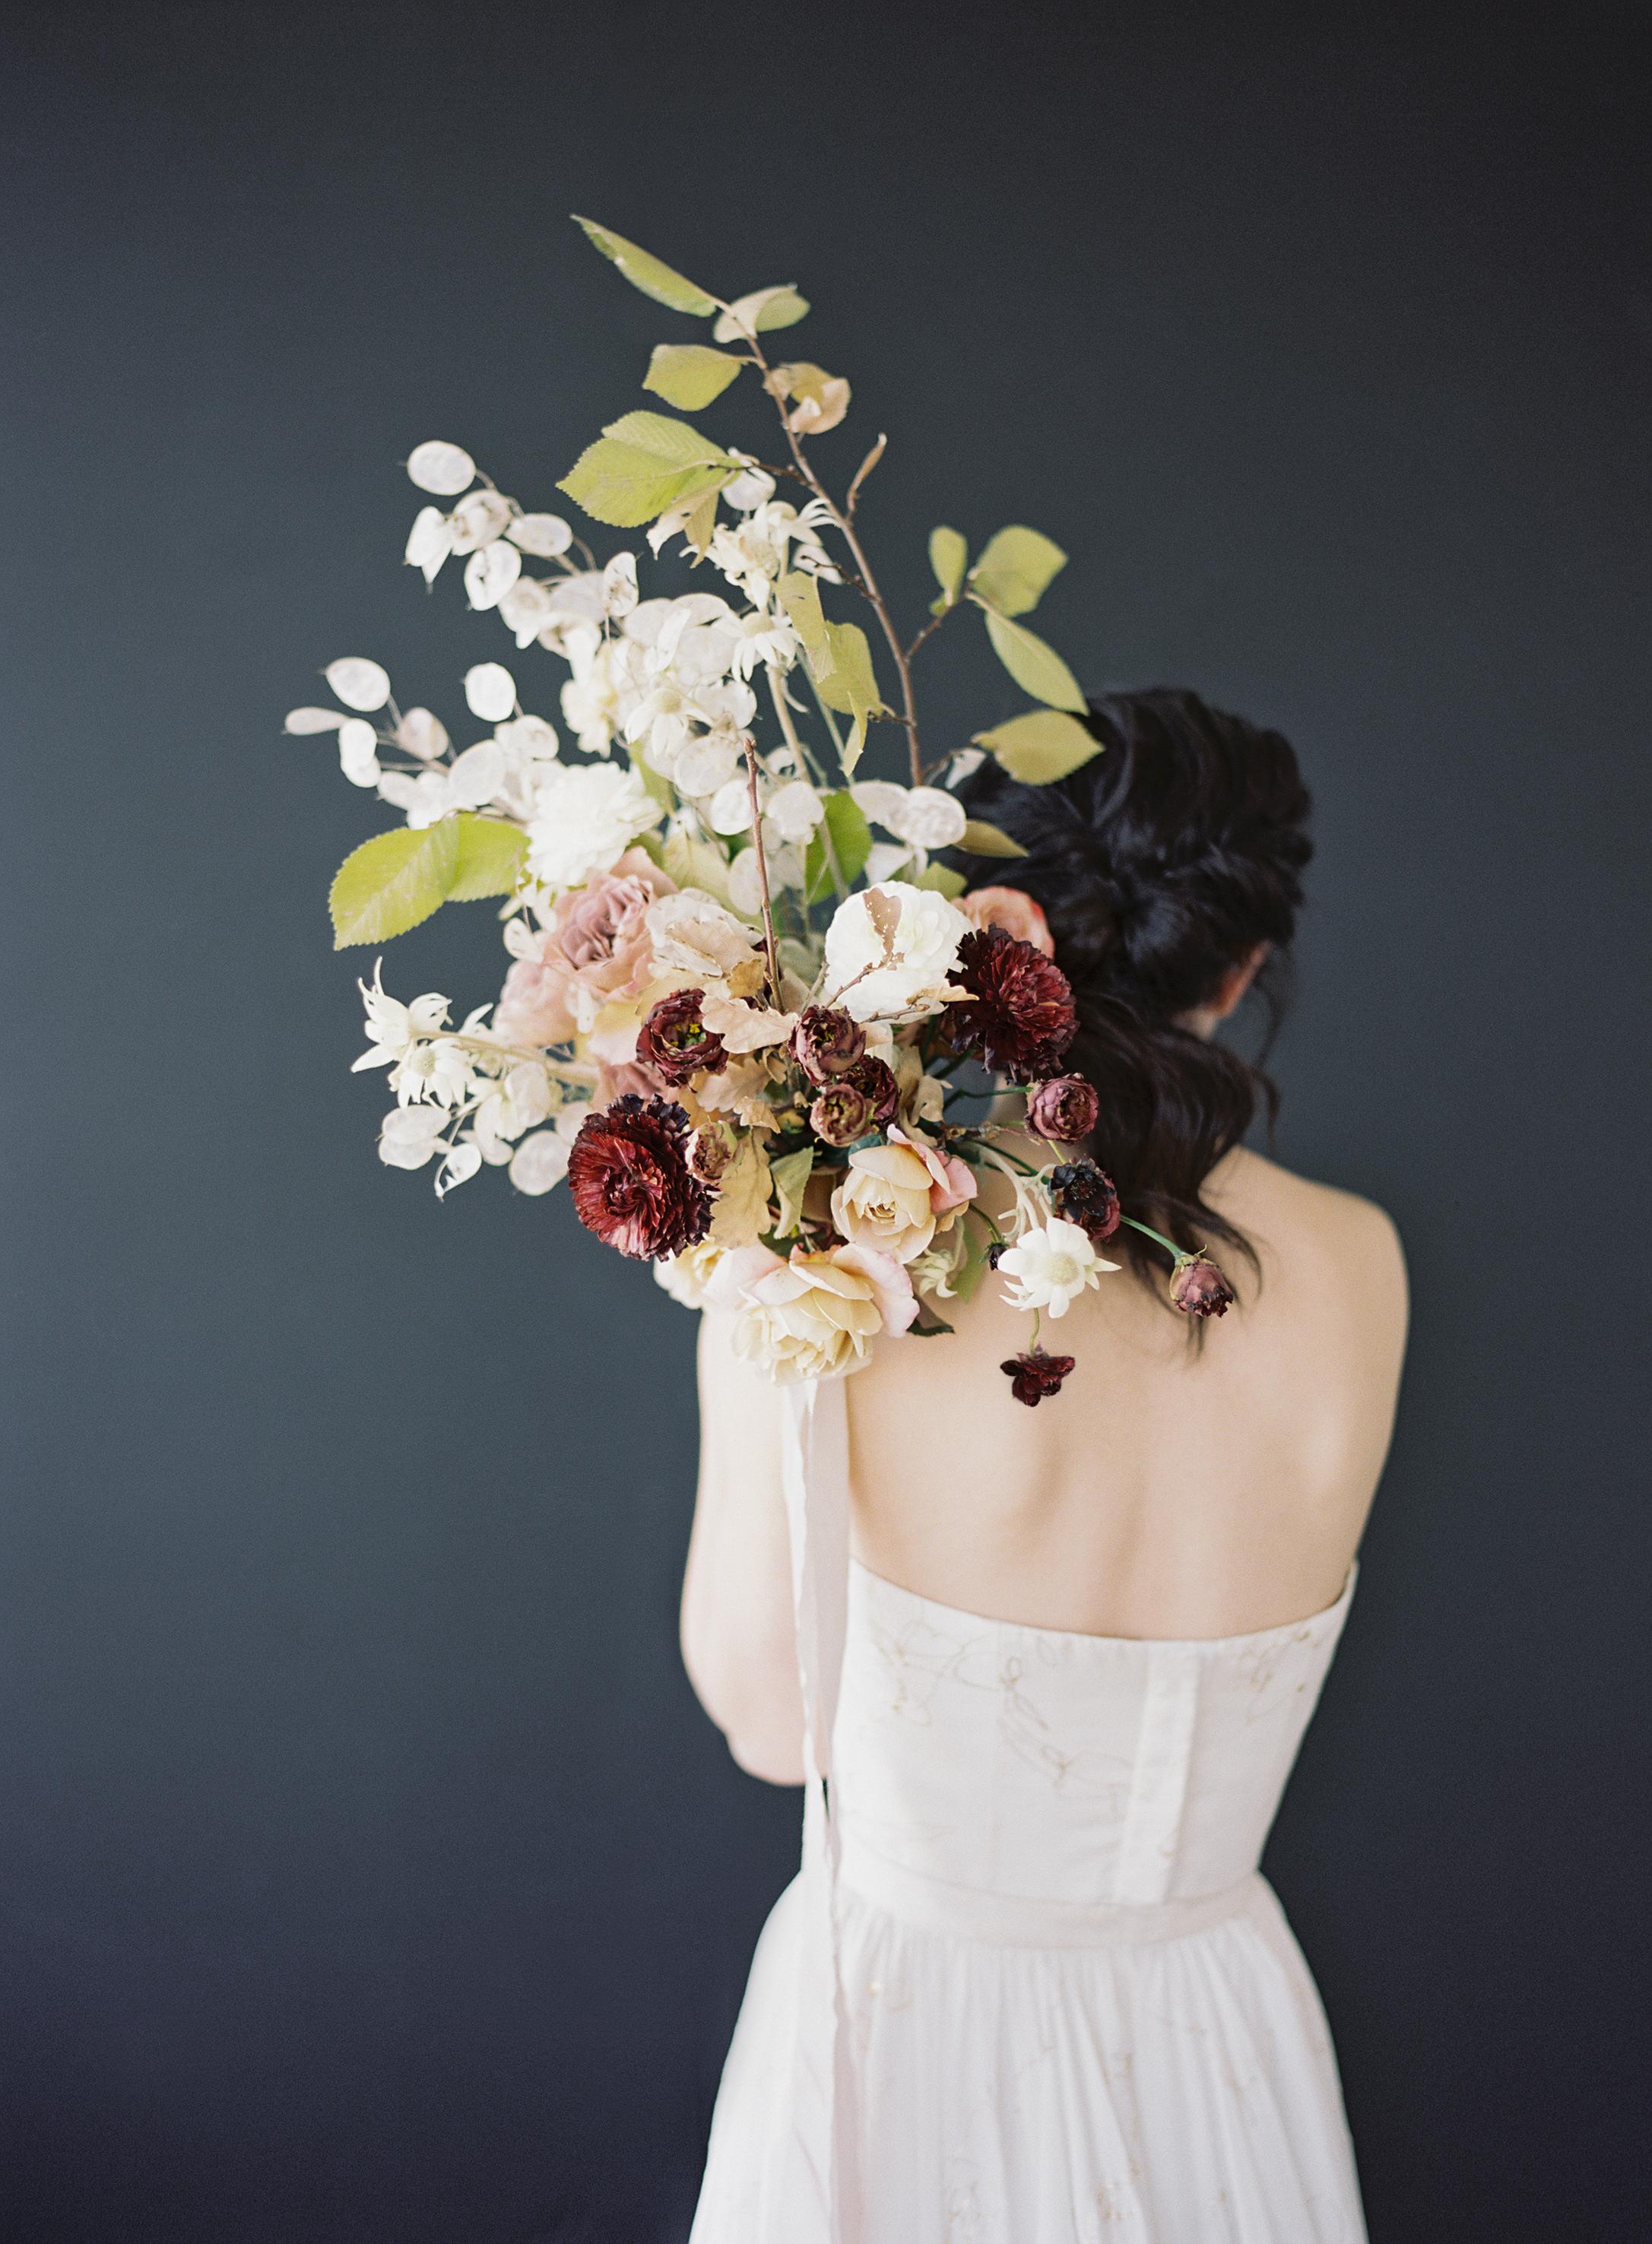 Sentient Floral Workshop-Carrie King Photographer-047.jpg